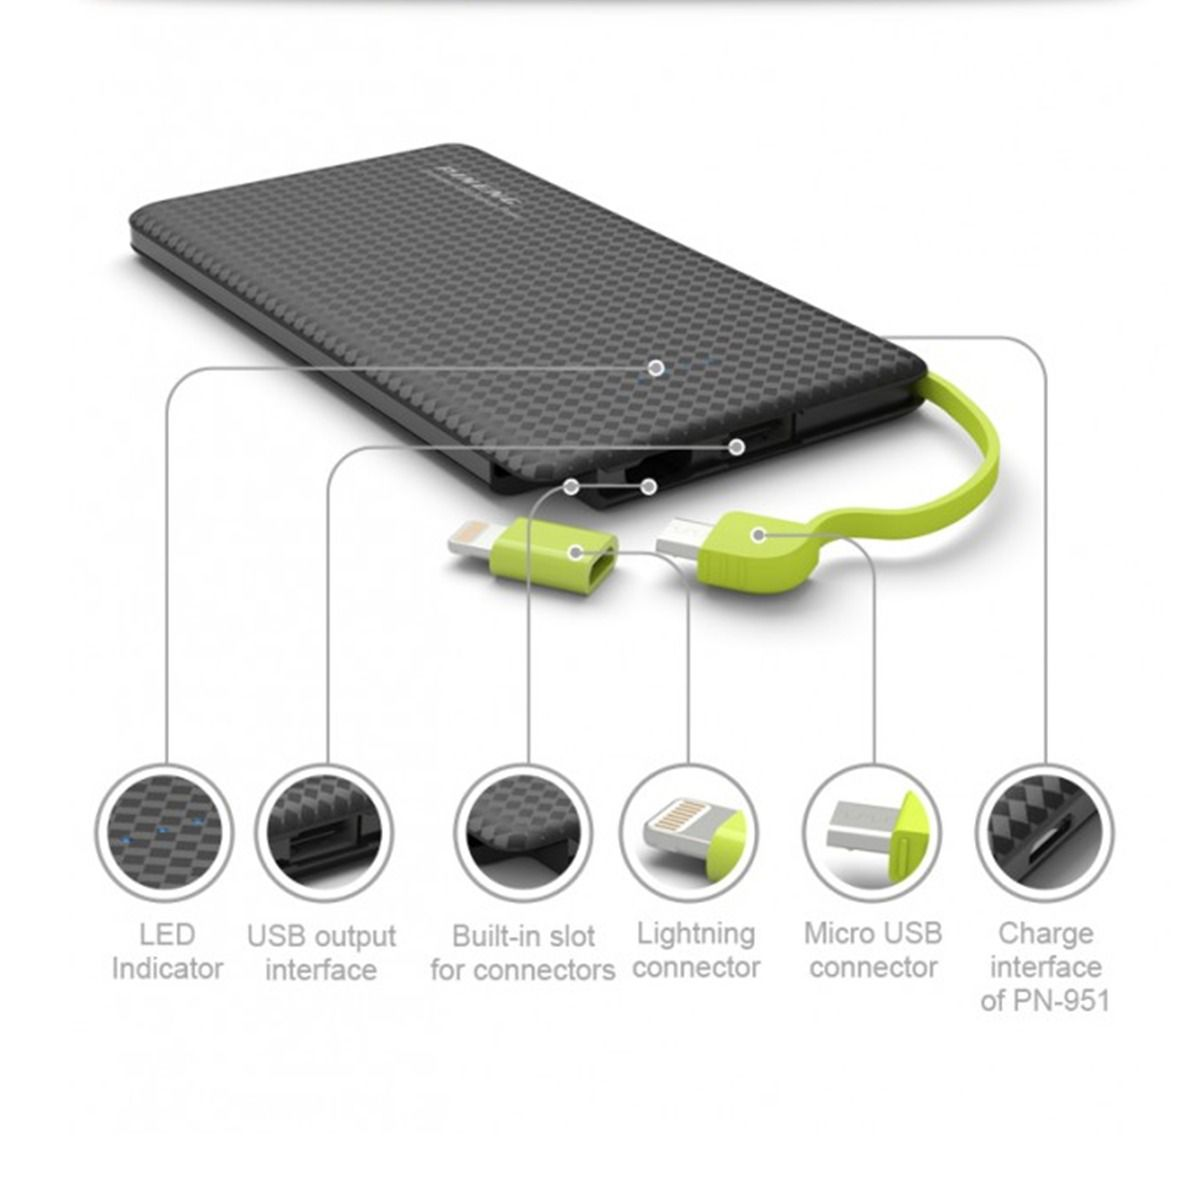 Bateria externa PN952